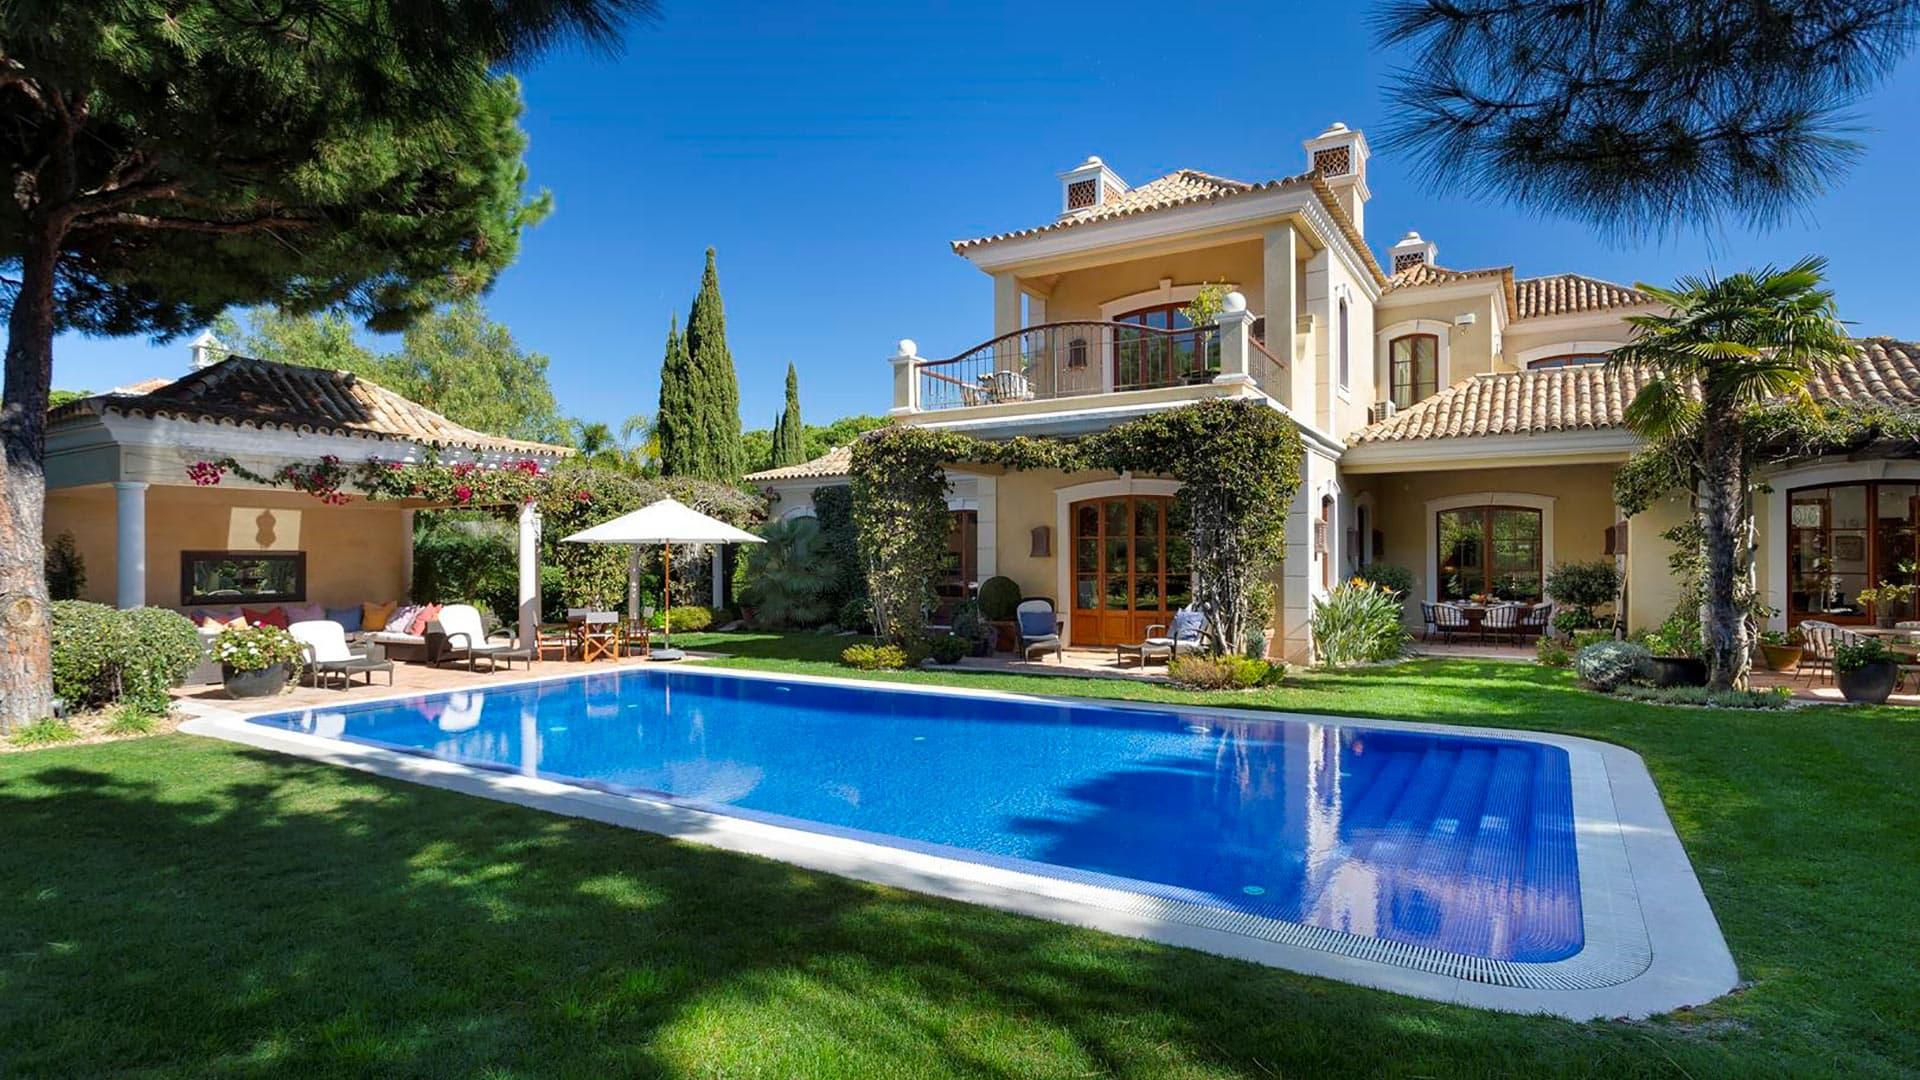 Location De Villa De Luxe Au Portugal | Villanovo dedans Location Maison Portugal Avec Piscine